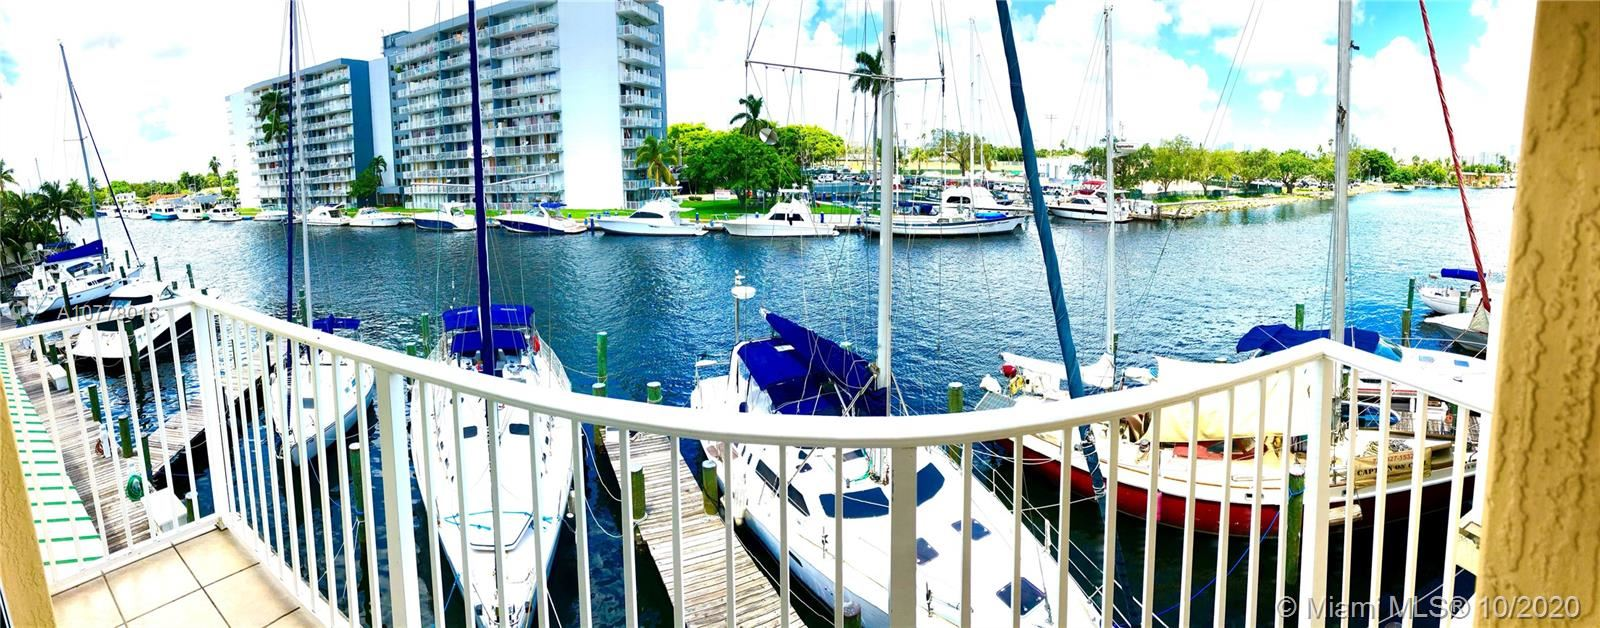 2415 NW 16th St Rd #316, Miami, FL 33125 - #: A10778016